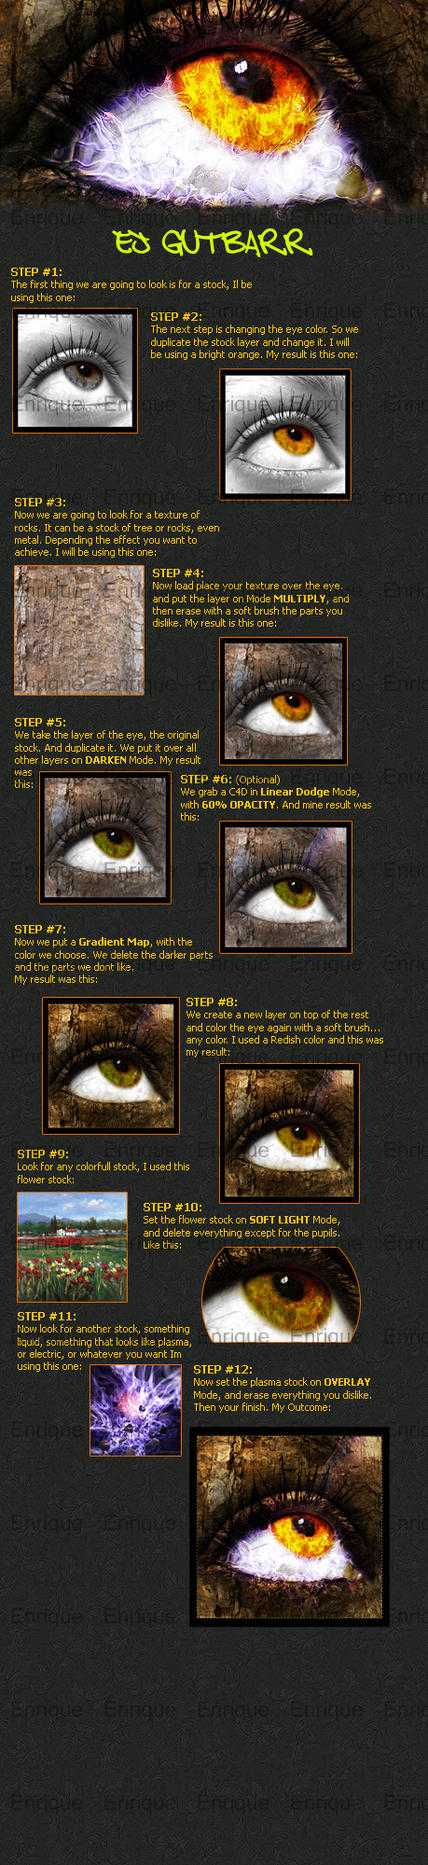 Eye Texture Photomanipulation by EJGUTBARR